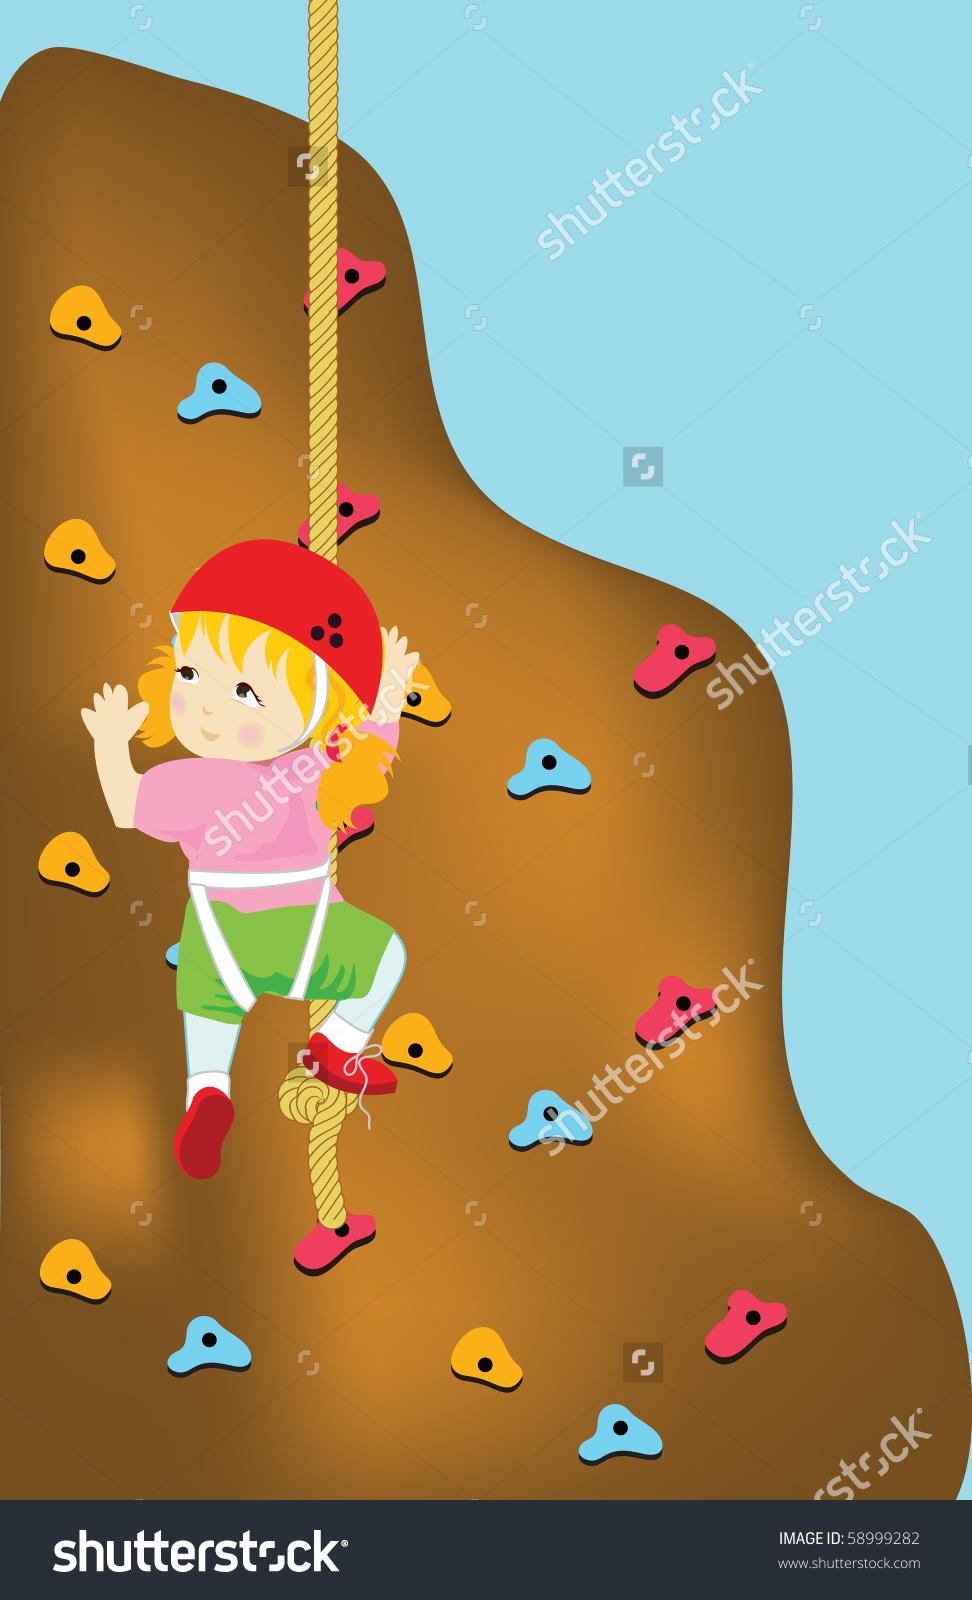 Toyota Little Rock >> Climbing area clipart - Clipground